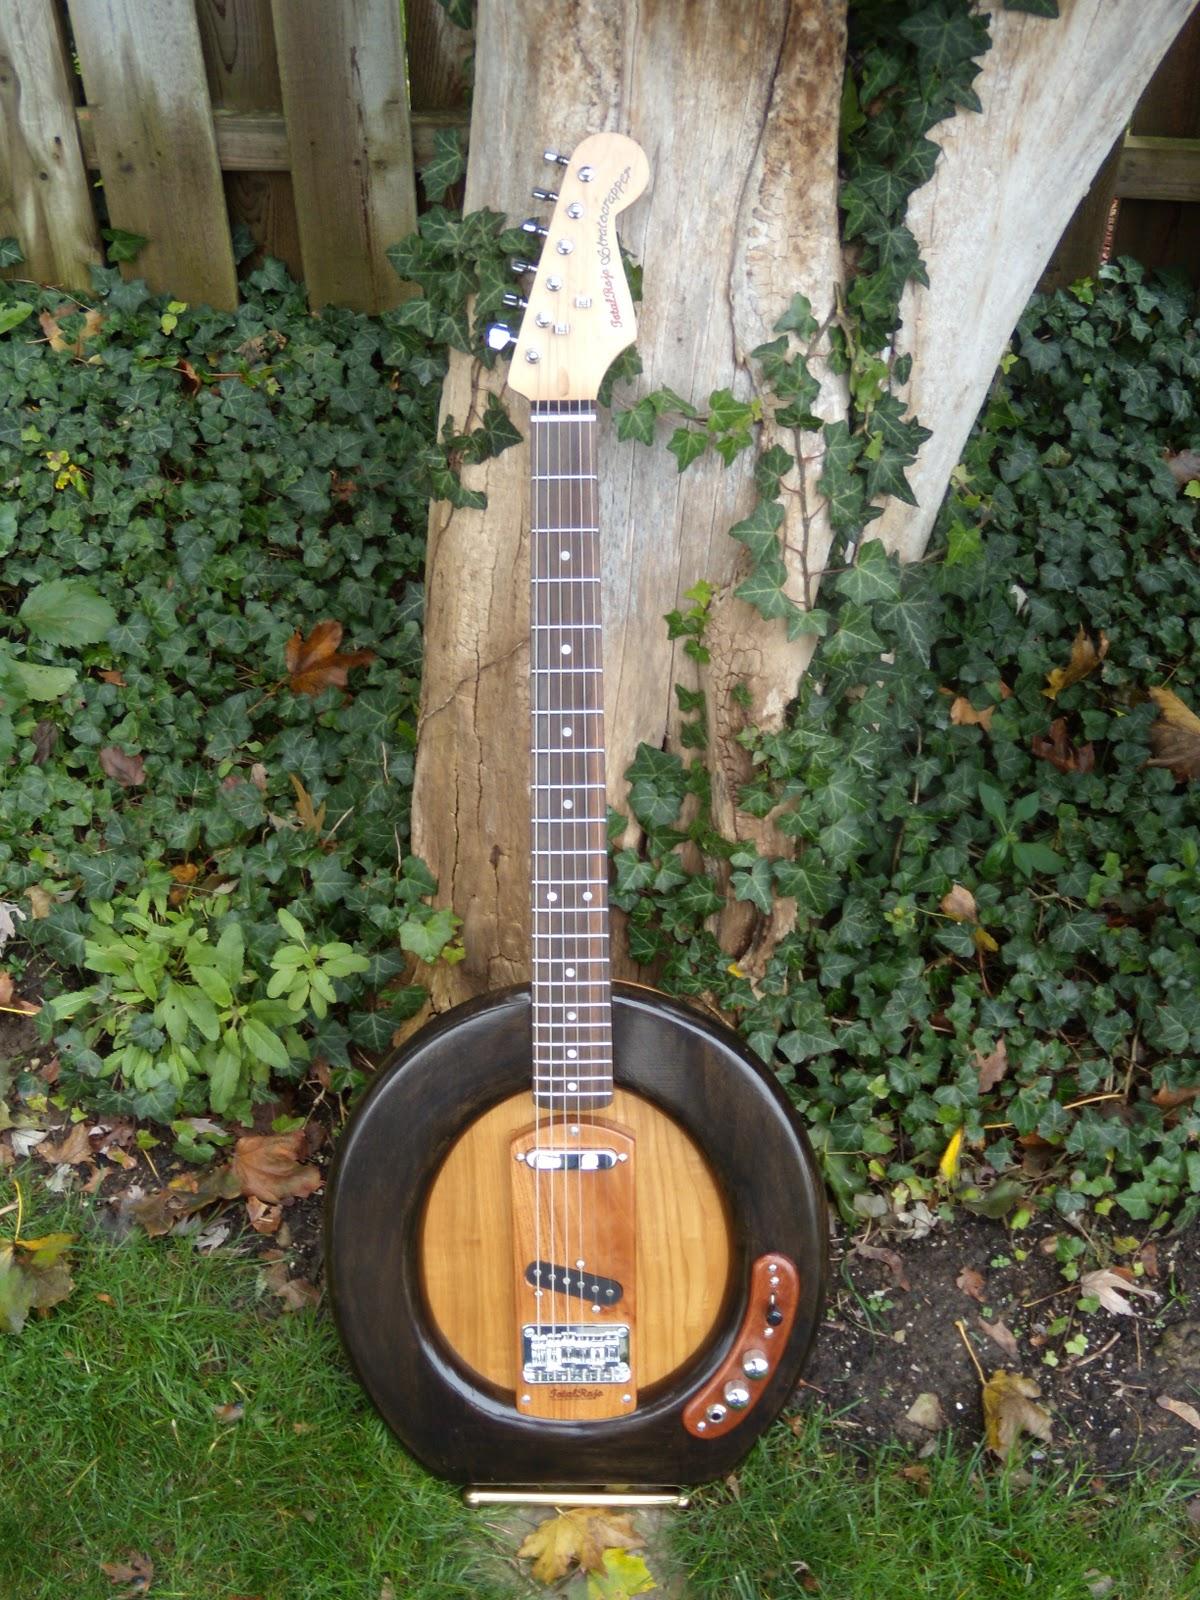 totalrojo guitars design decoration 39 how to 39 for cigar box guitar. Black Bedroom Furniture Sets. Home Design Ideas